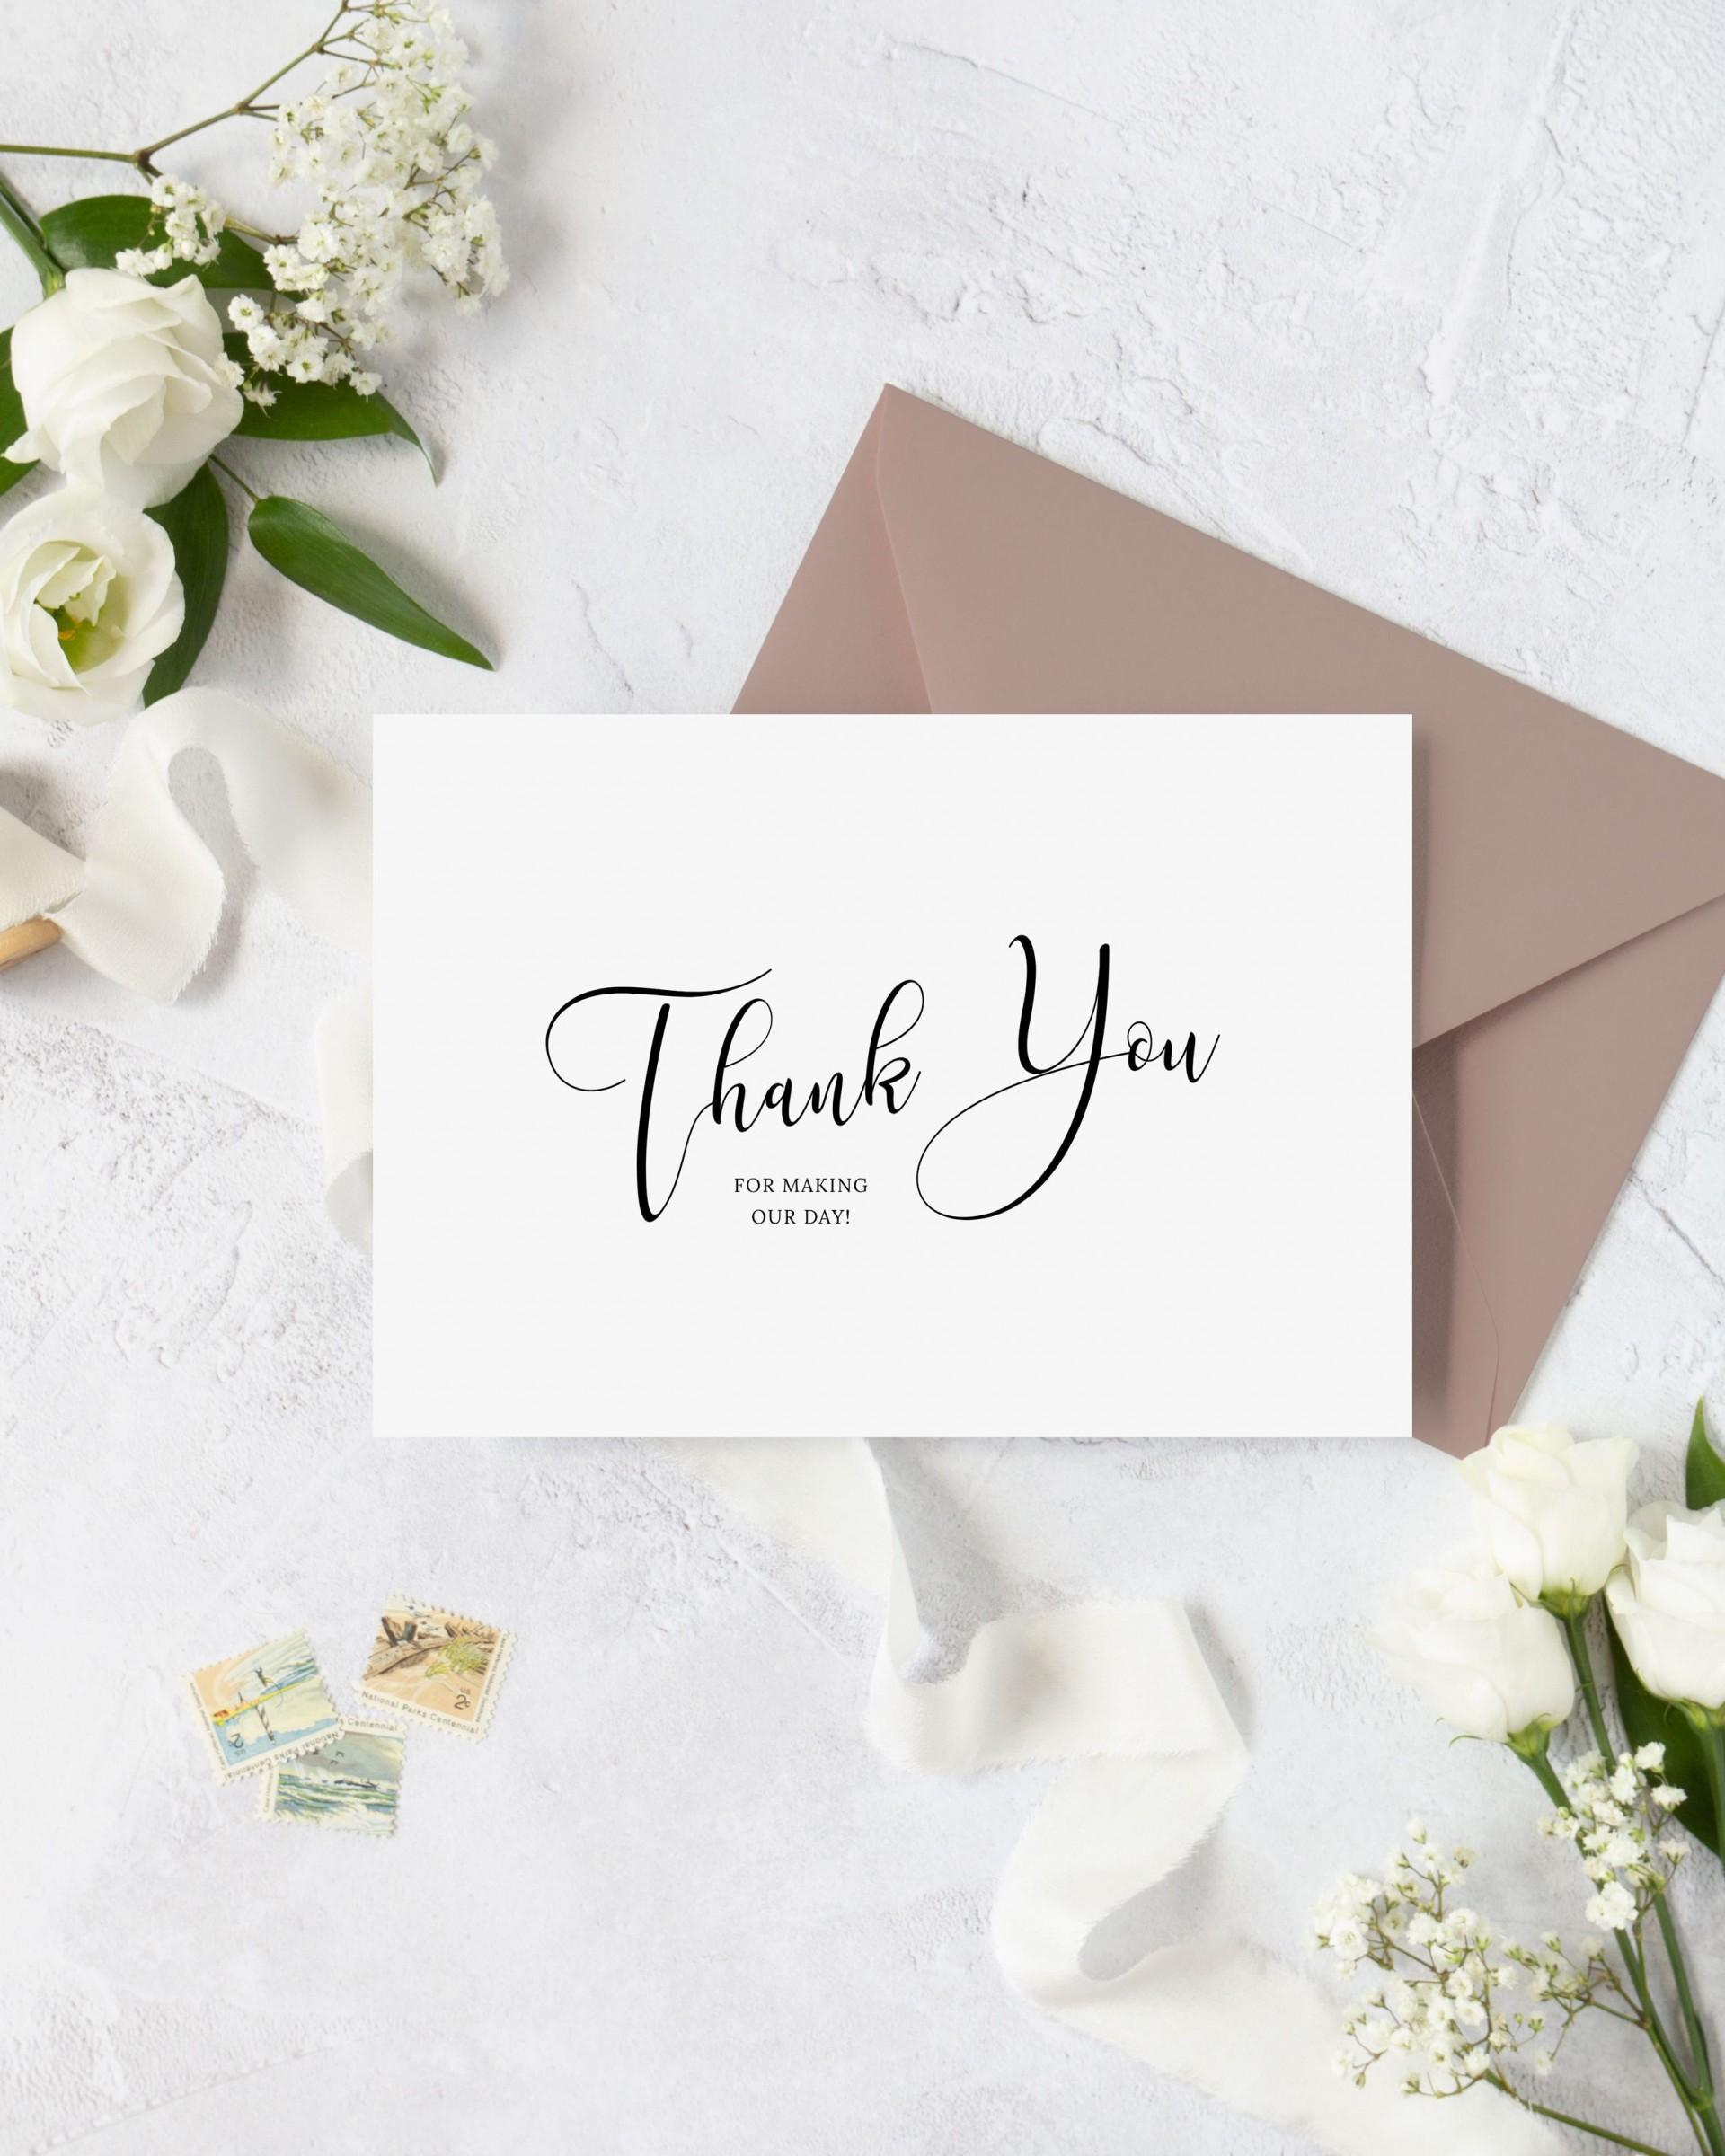 001 Singular Diy Wedding Thank You Card Template Inspiration  Templates1920